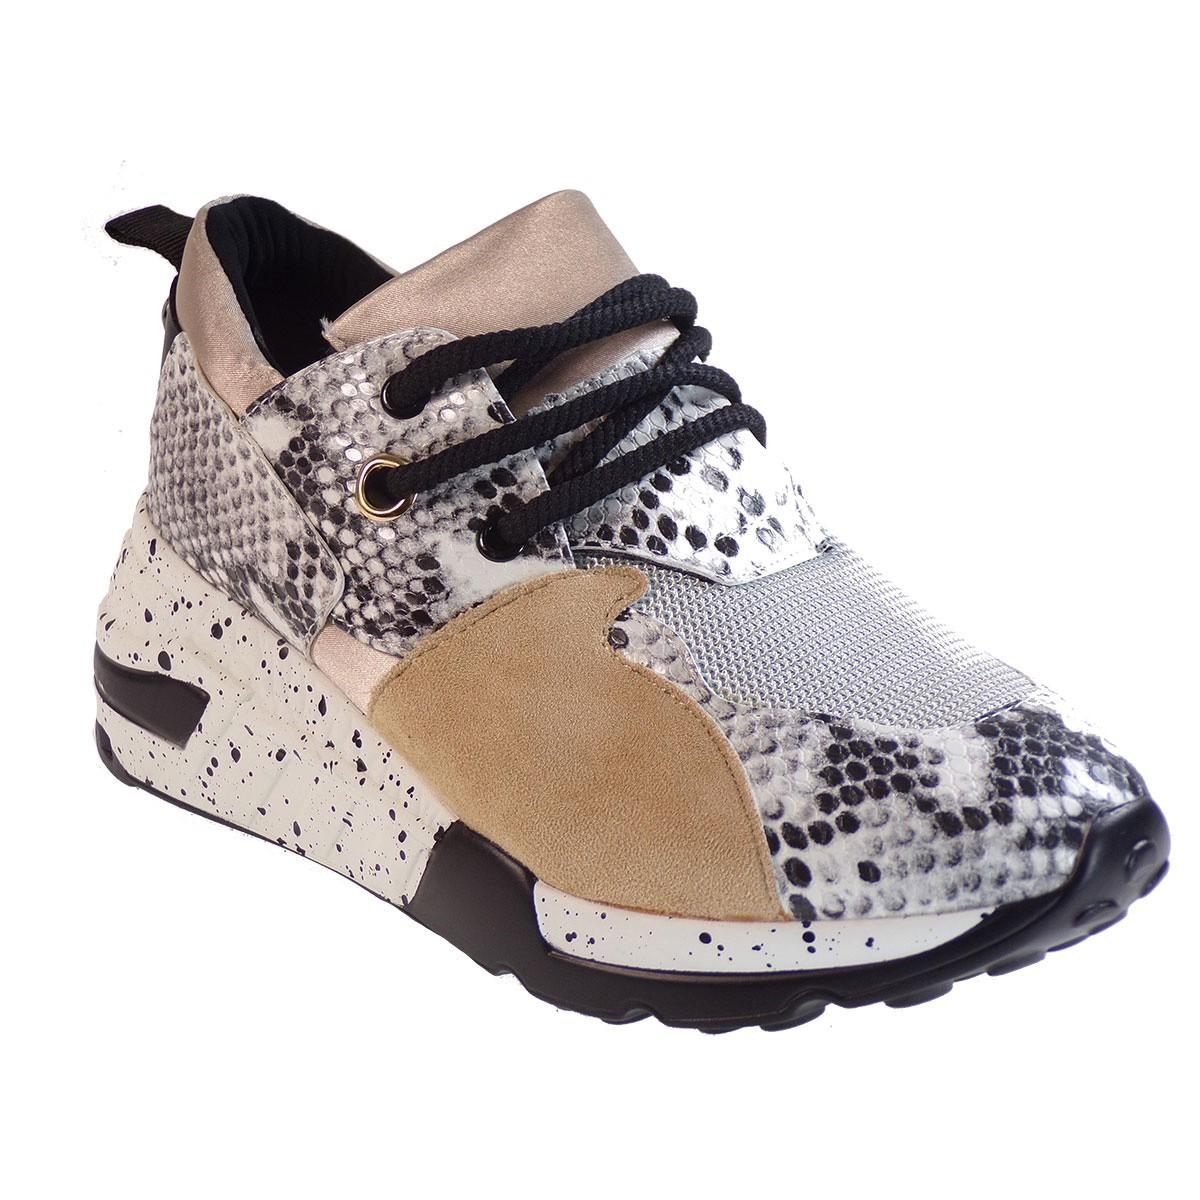 Bagiota Shoes Γυναικεία Παπούτσια Sneakers Αθλητικά H8956 Λευκό